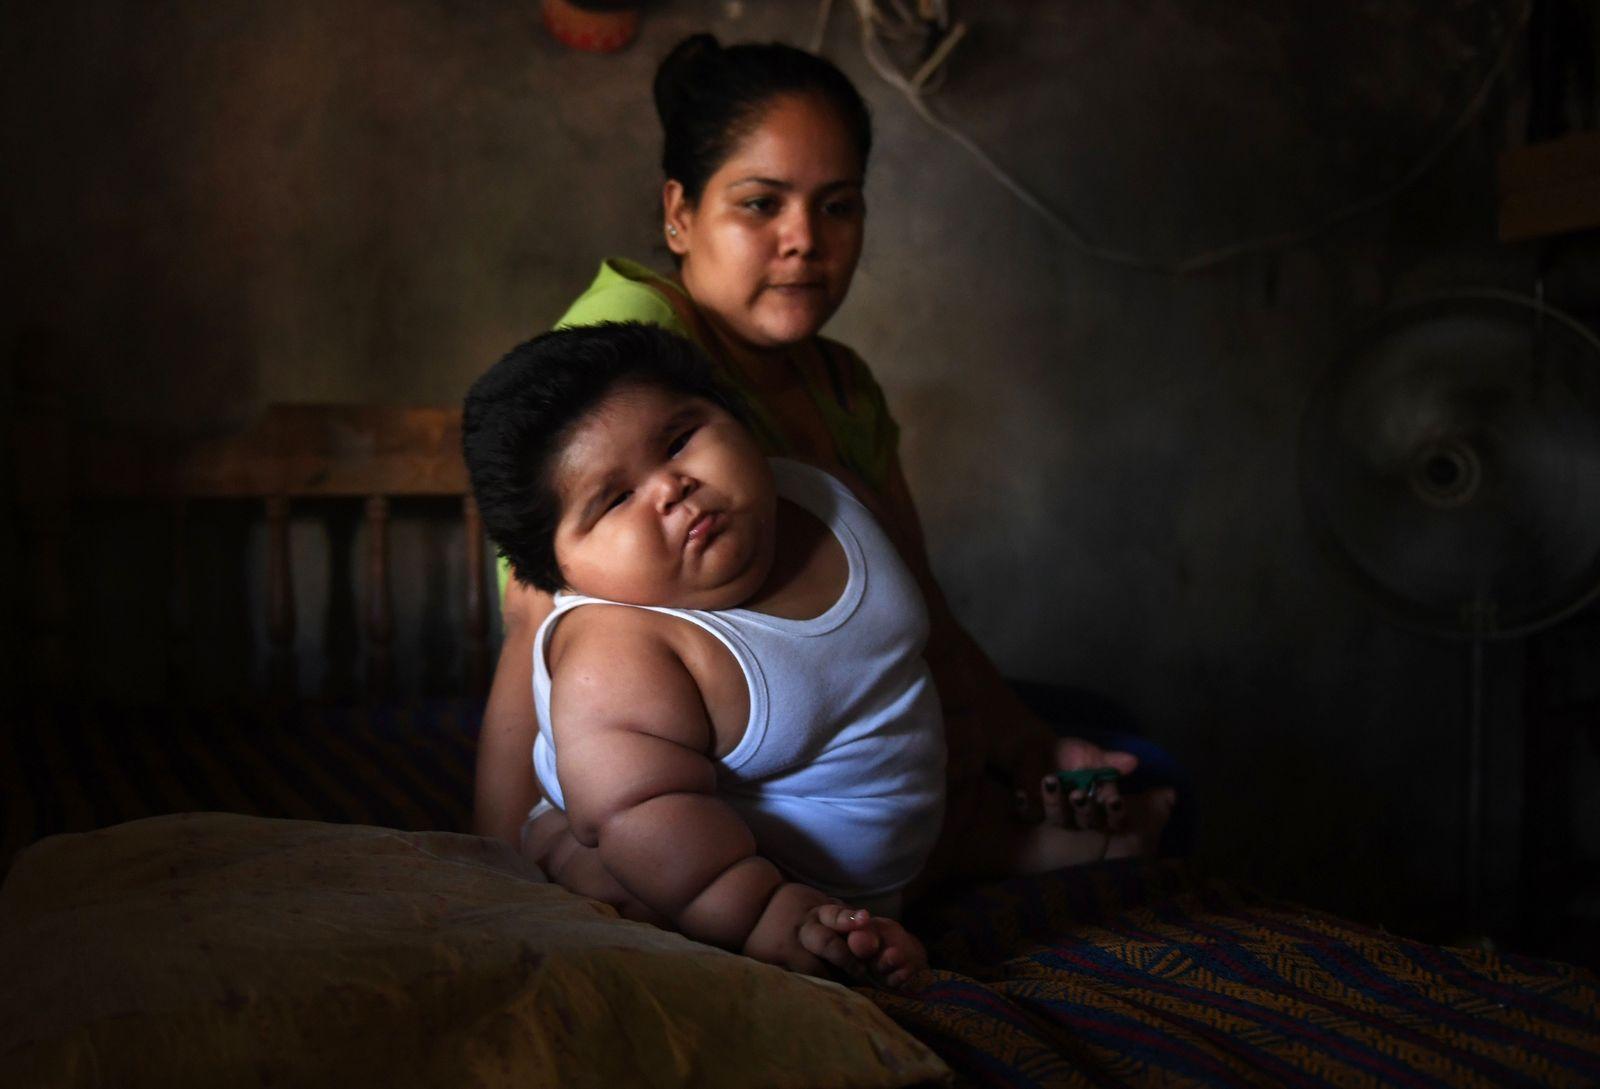 MEXICO-HEALTH-CHILD-OBESITY